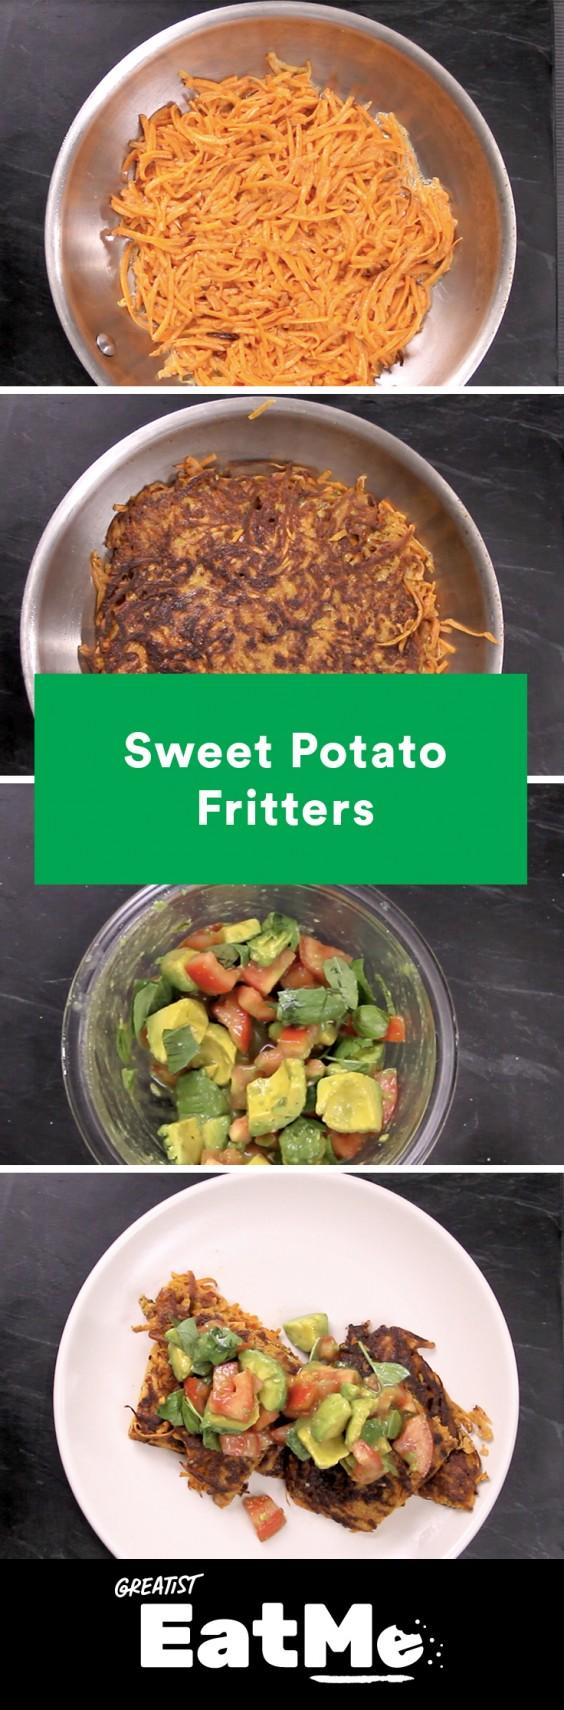 Eat Me Video: Sweet Potato Fritters